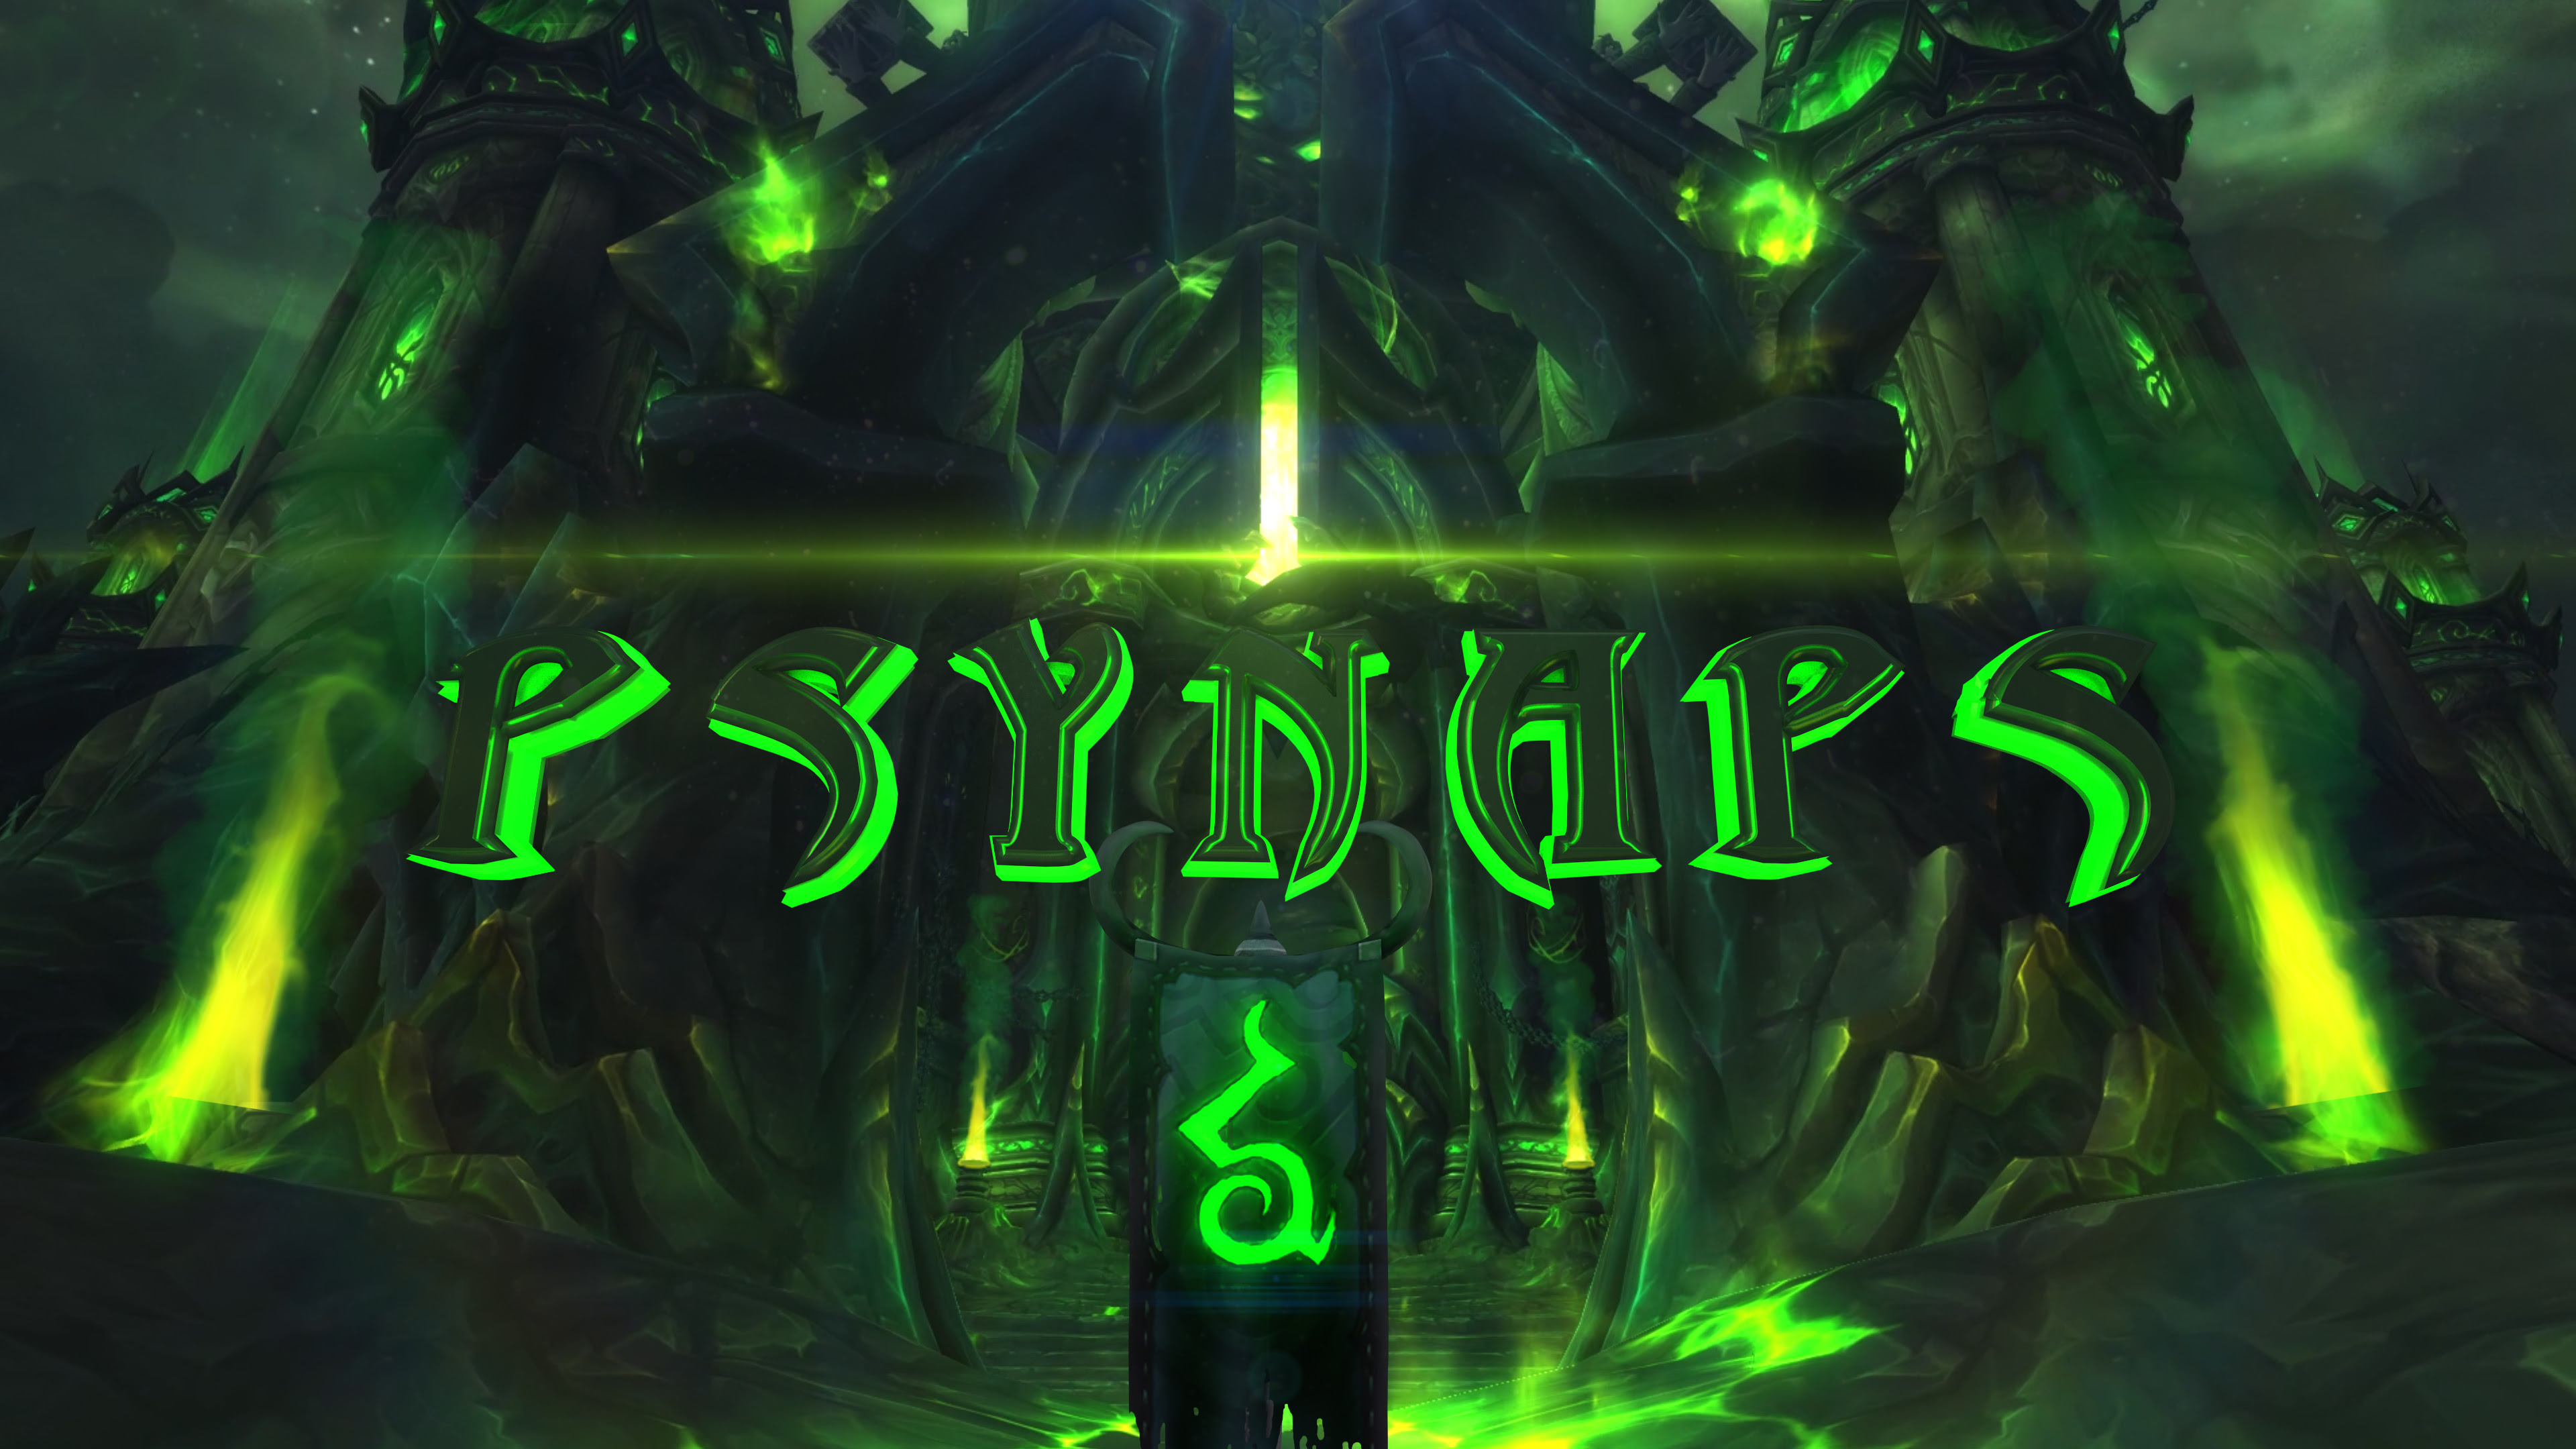 Wow Legion 4k Wallpaper By Psynaps Psynaptic Media By Psynaps